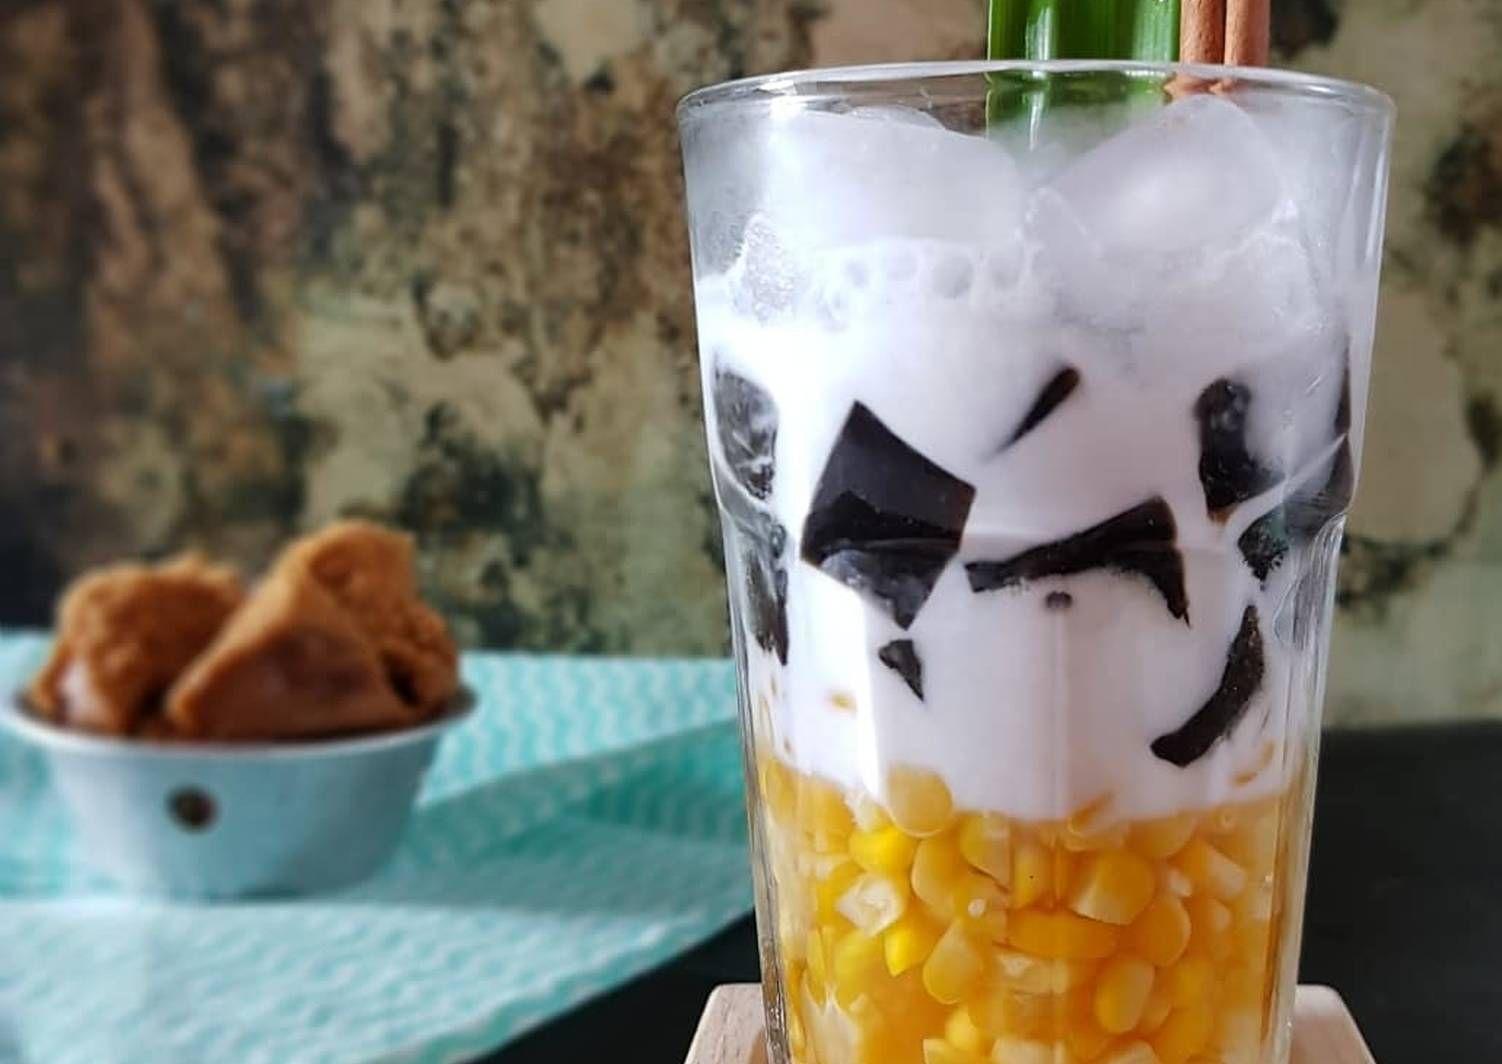 Resep Es Jagung Manis Cincau Oleh Nila Iswahyudi Resep Cincau Minuman Smoothies Resep Minuman